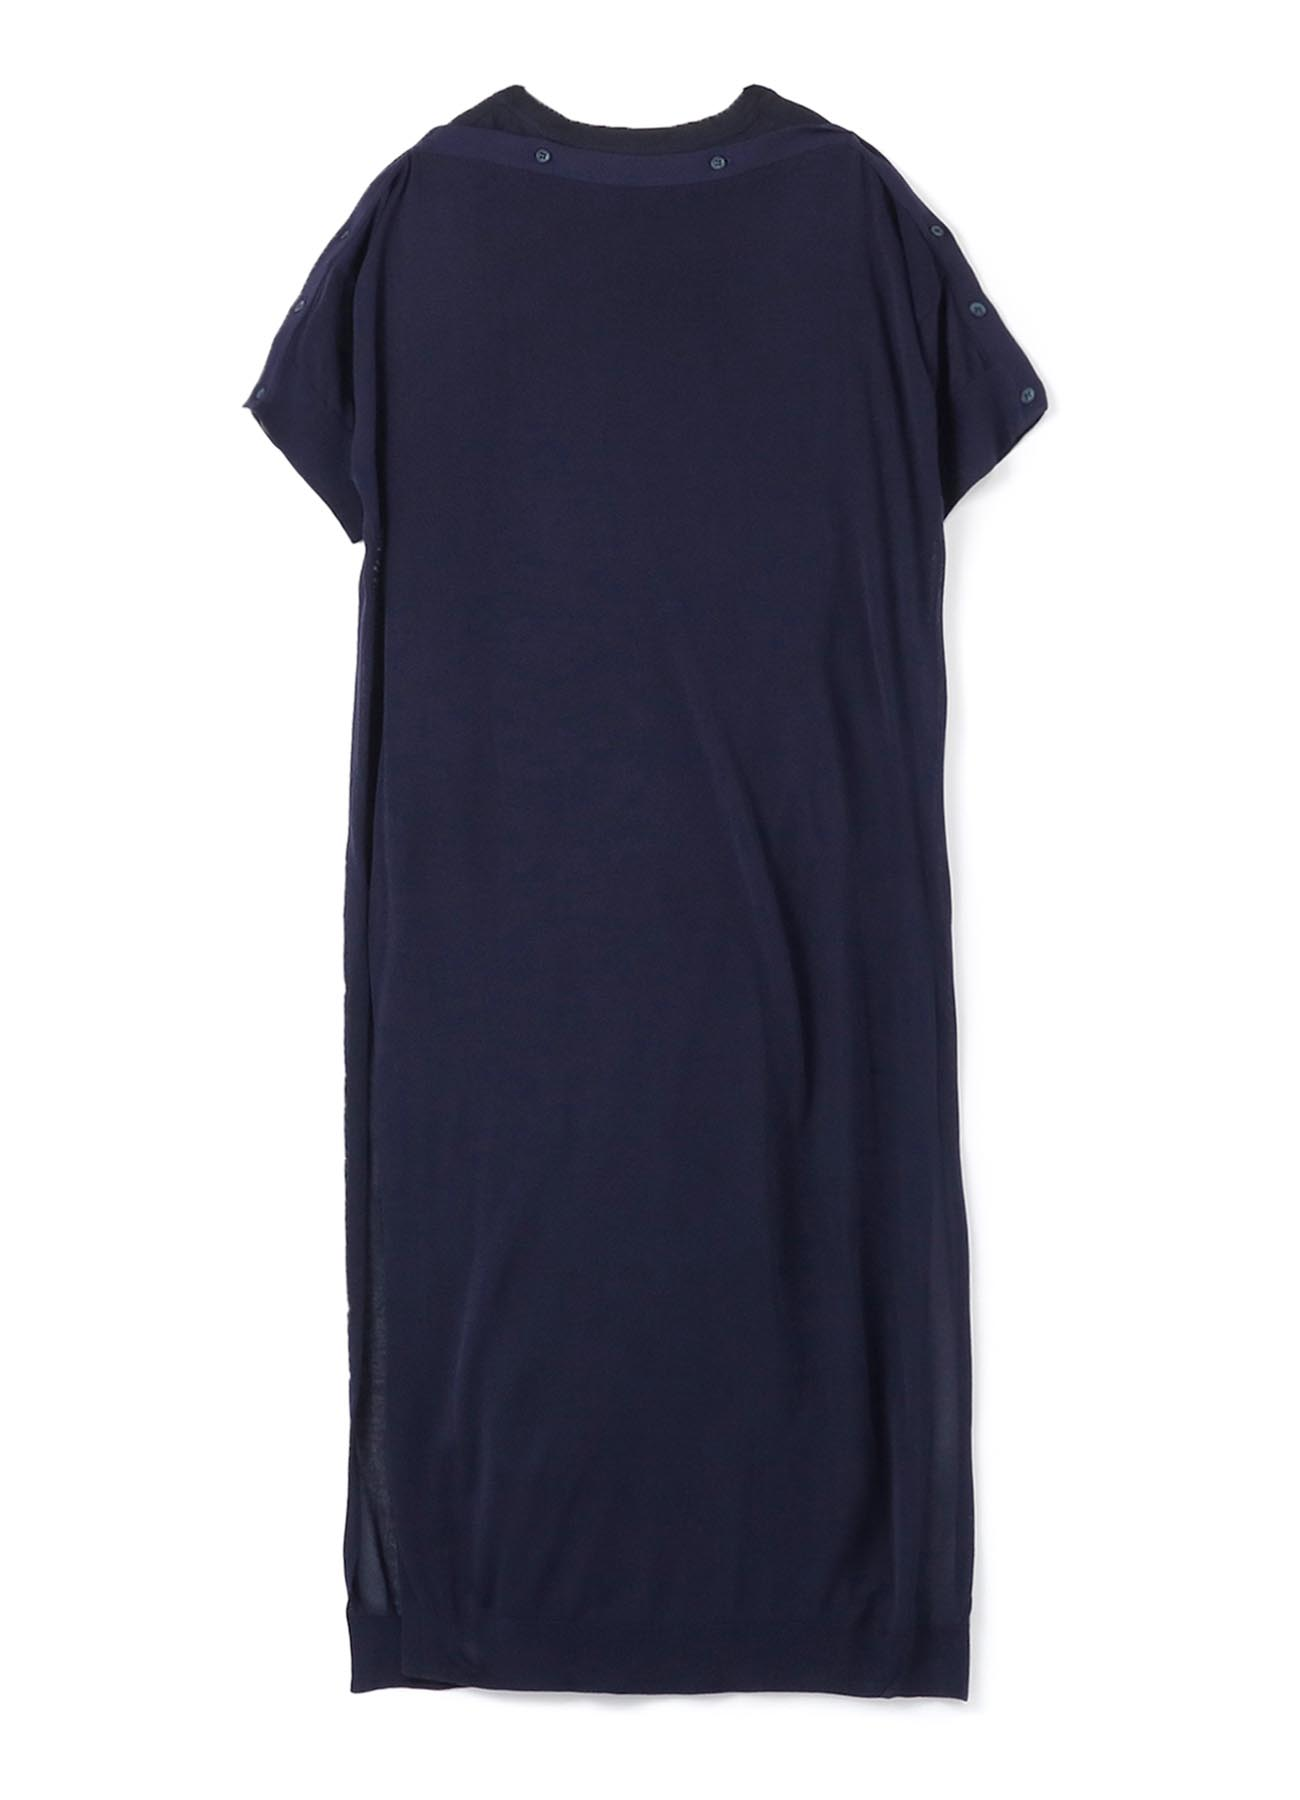 1/52Ry/Ny14G2P PLAIN STITCH BUTTON OPEN SLEEVE DRESS